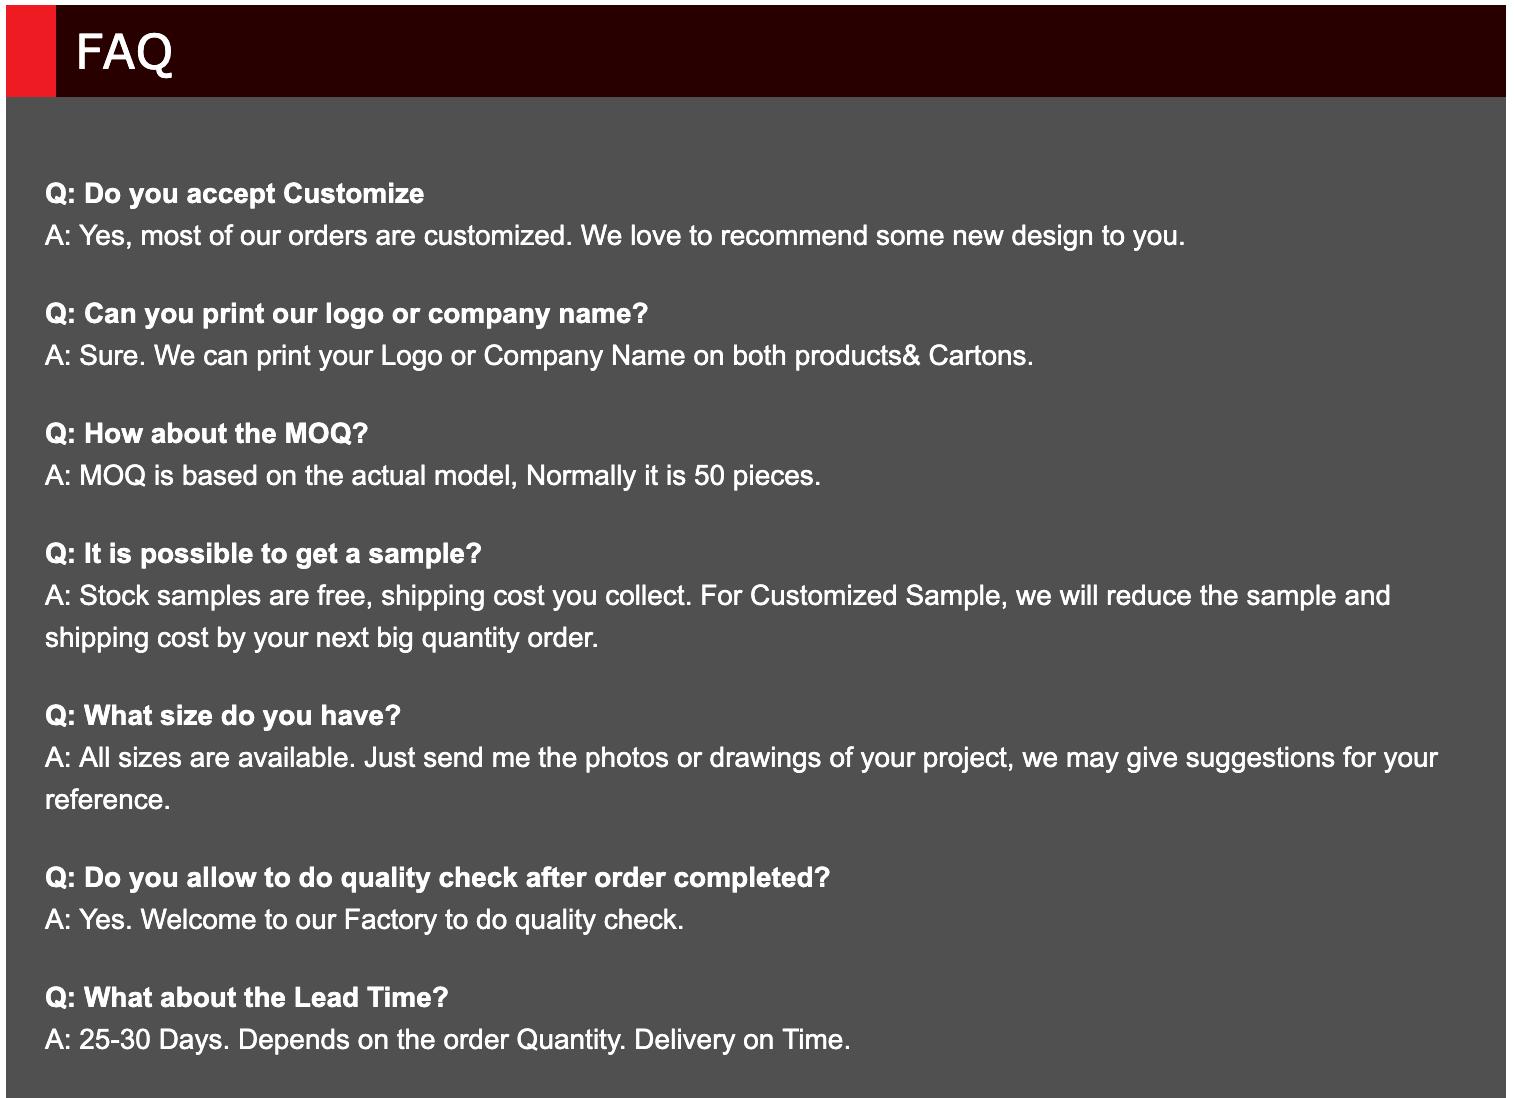 Custom Mirror Manufacturers FAQ